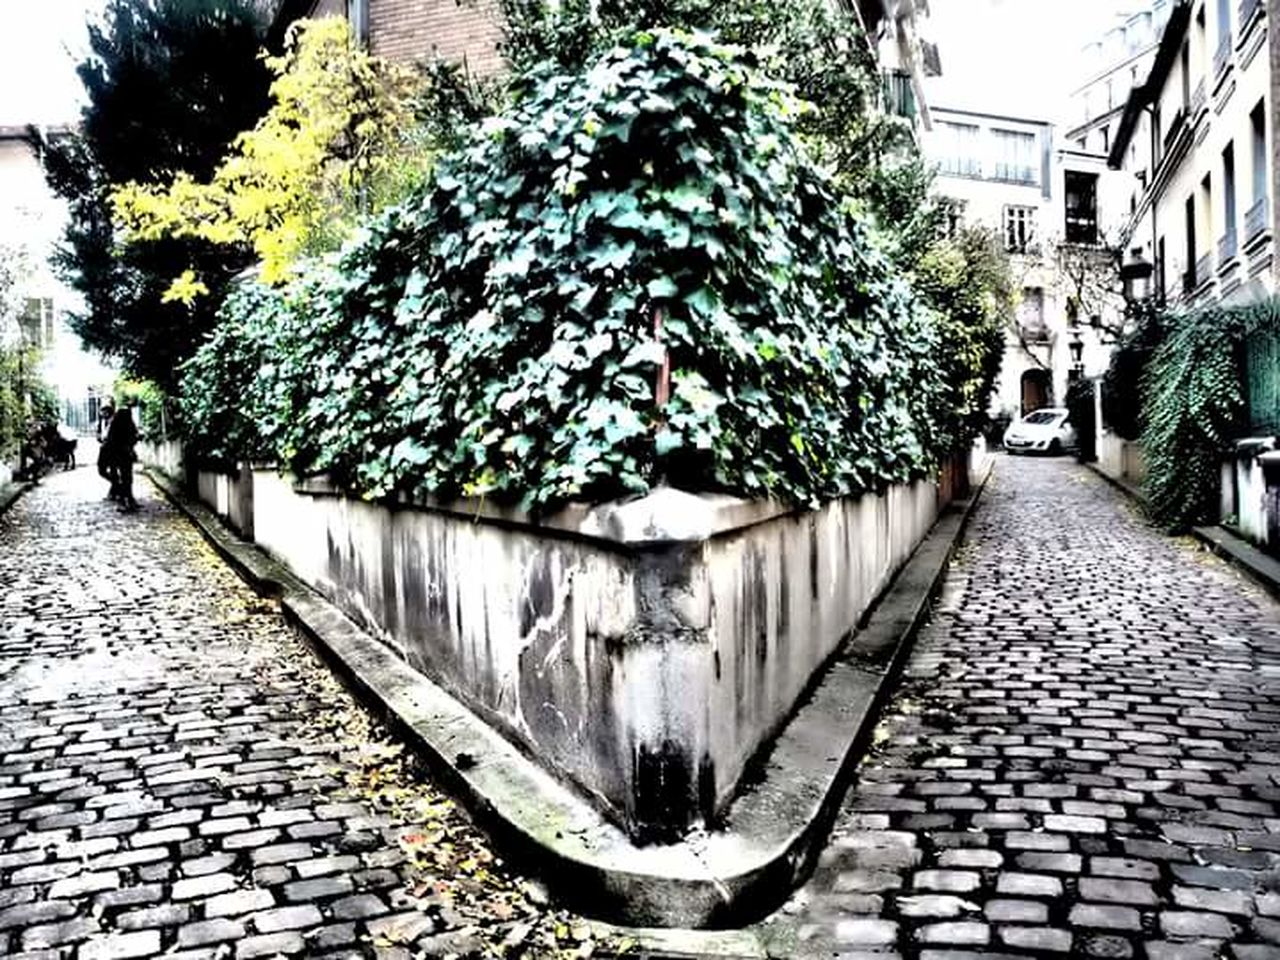 Paris Sentier Fantastique